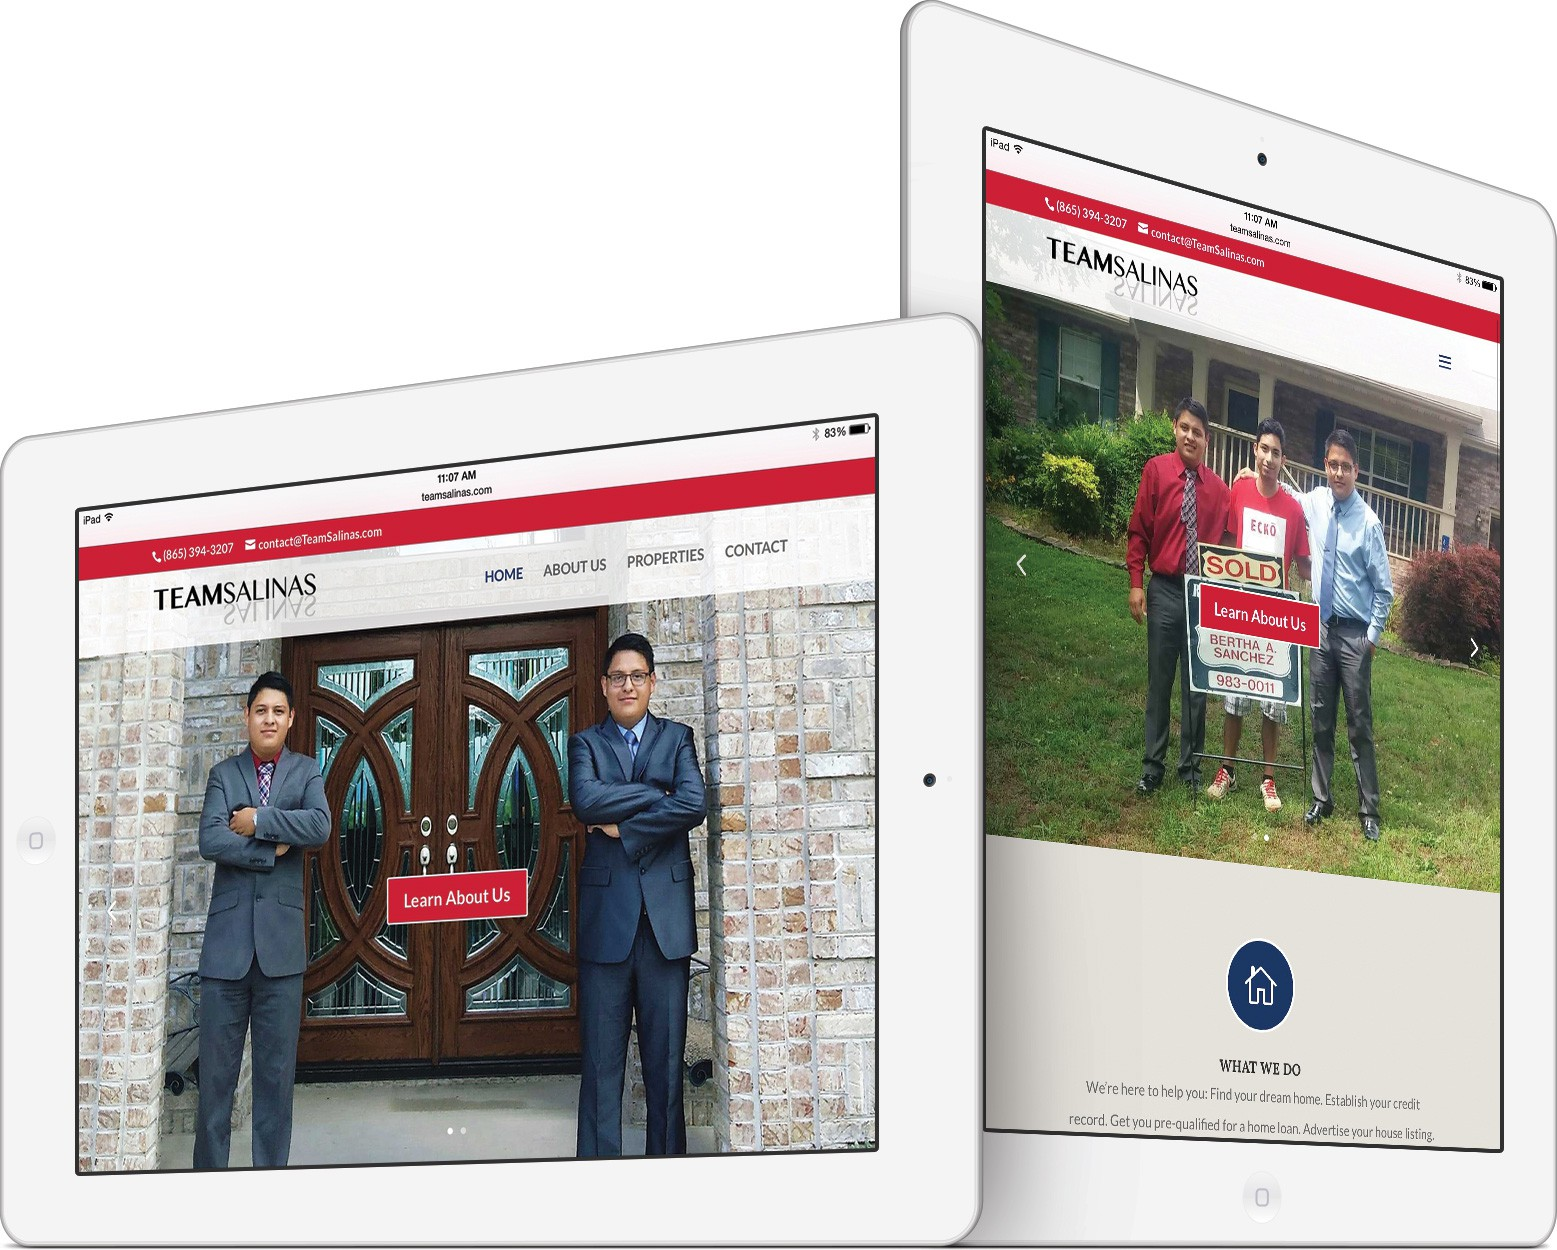 Team Salinas on an iPad